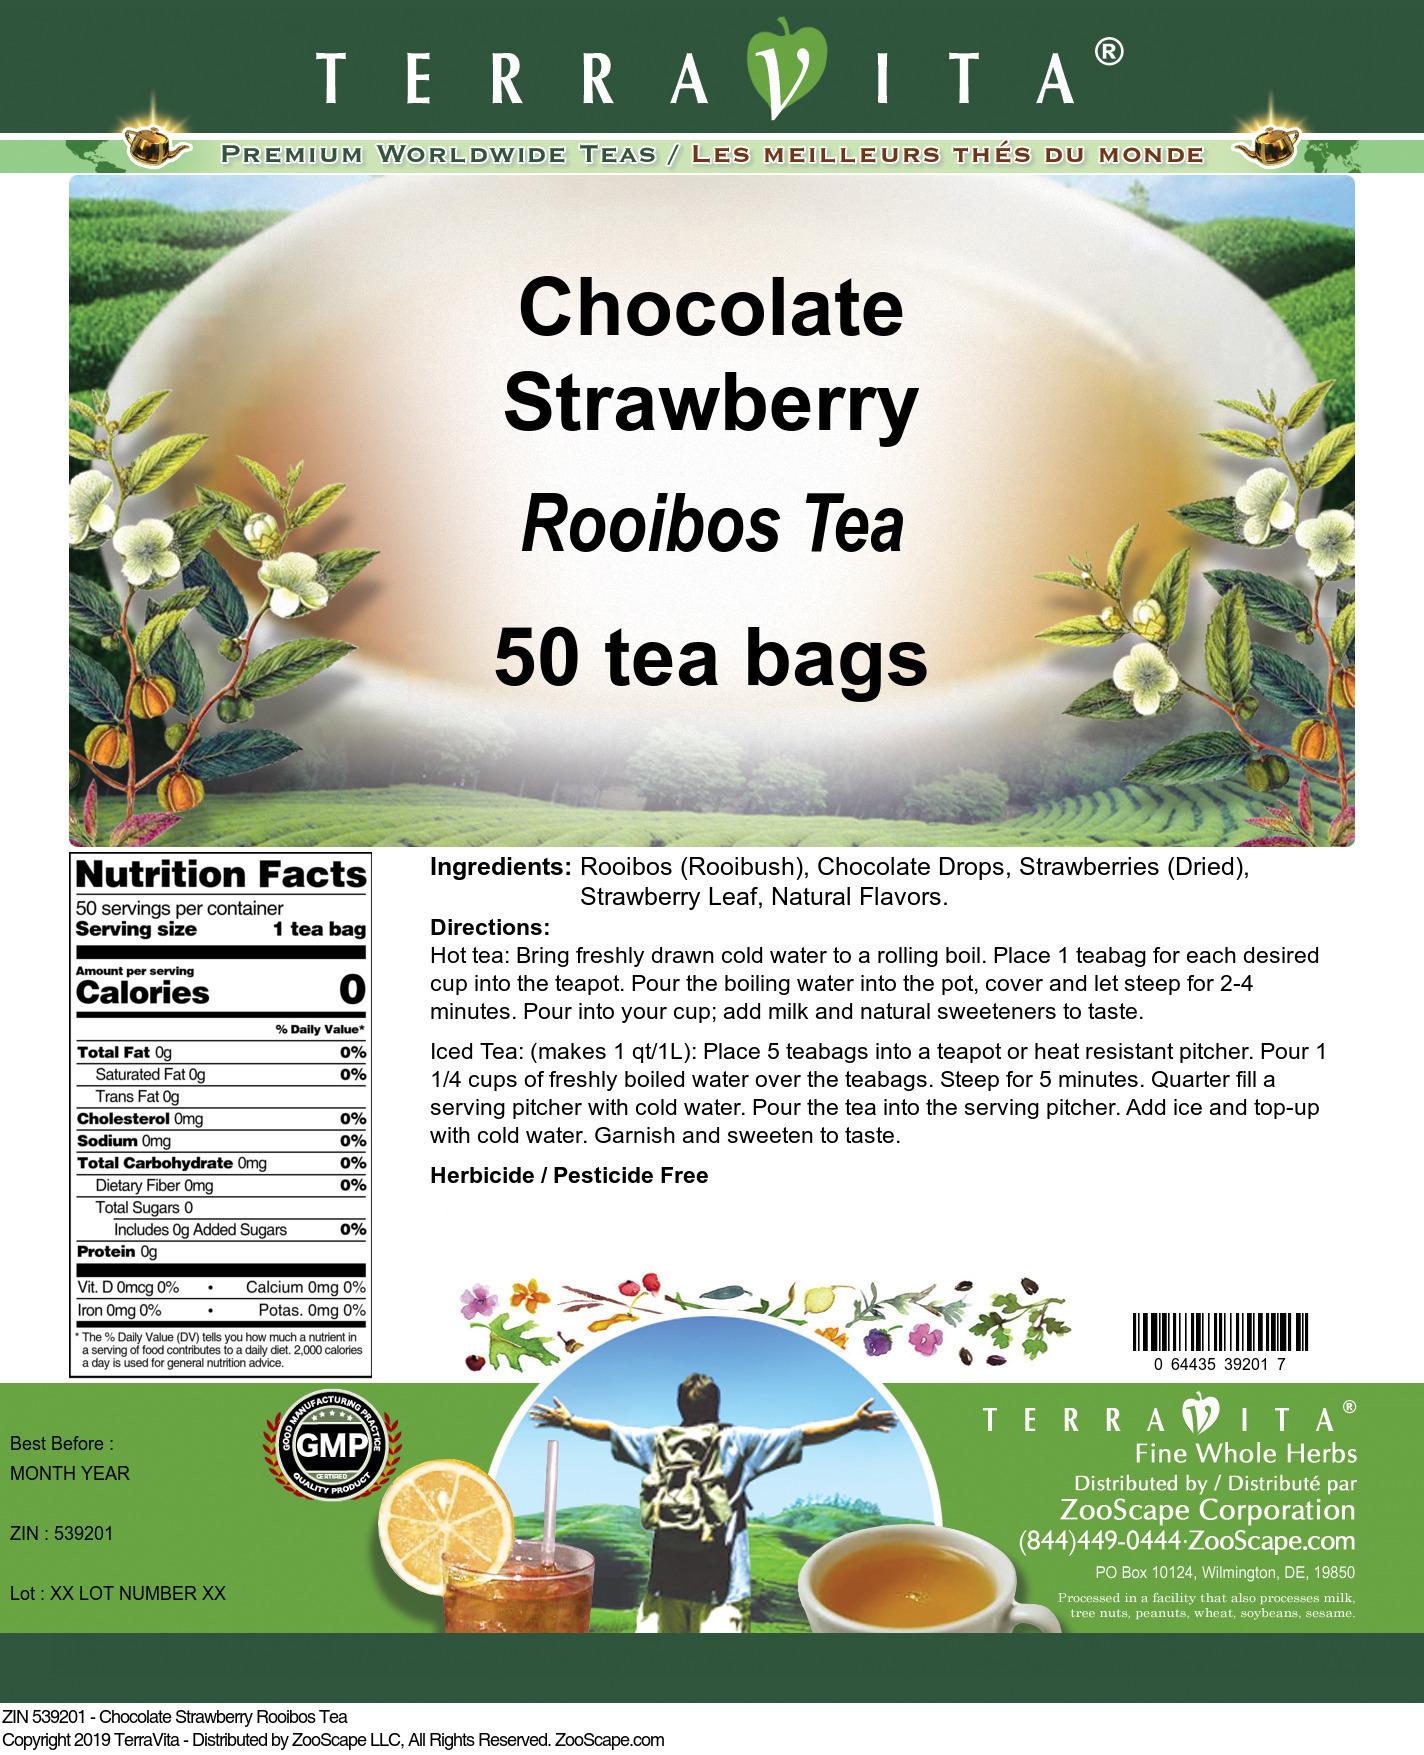 Chocolate Strawberry Rooibos Tea